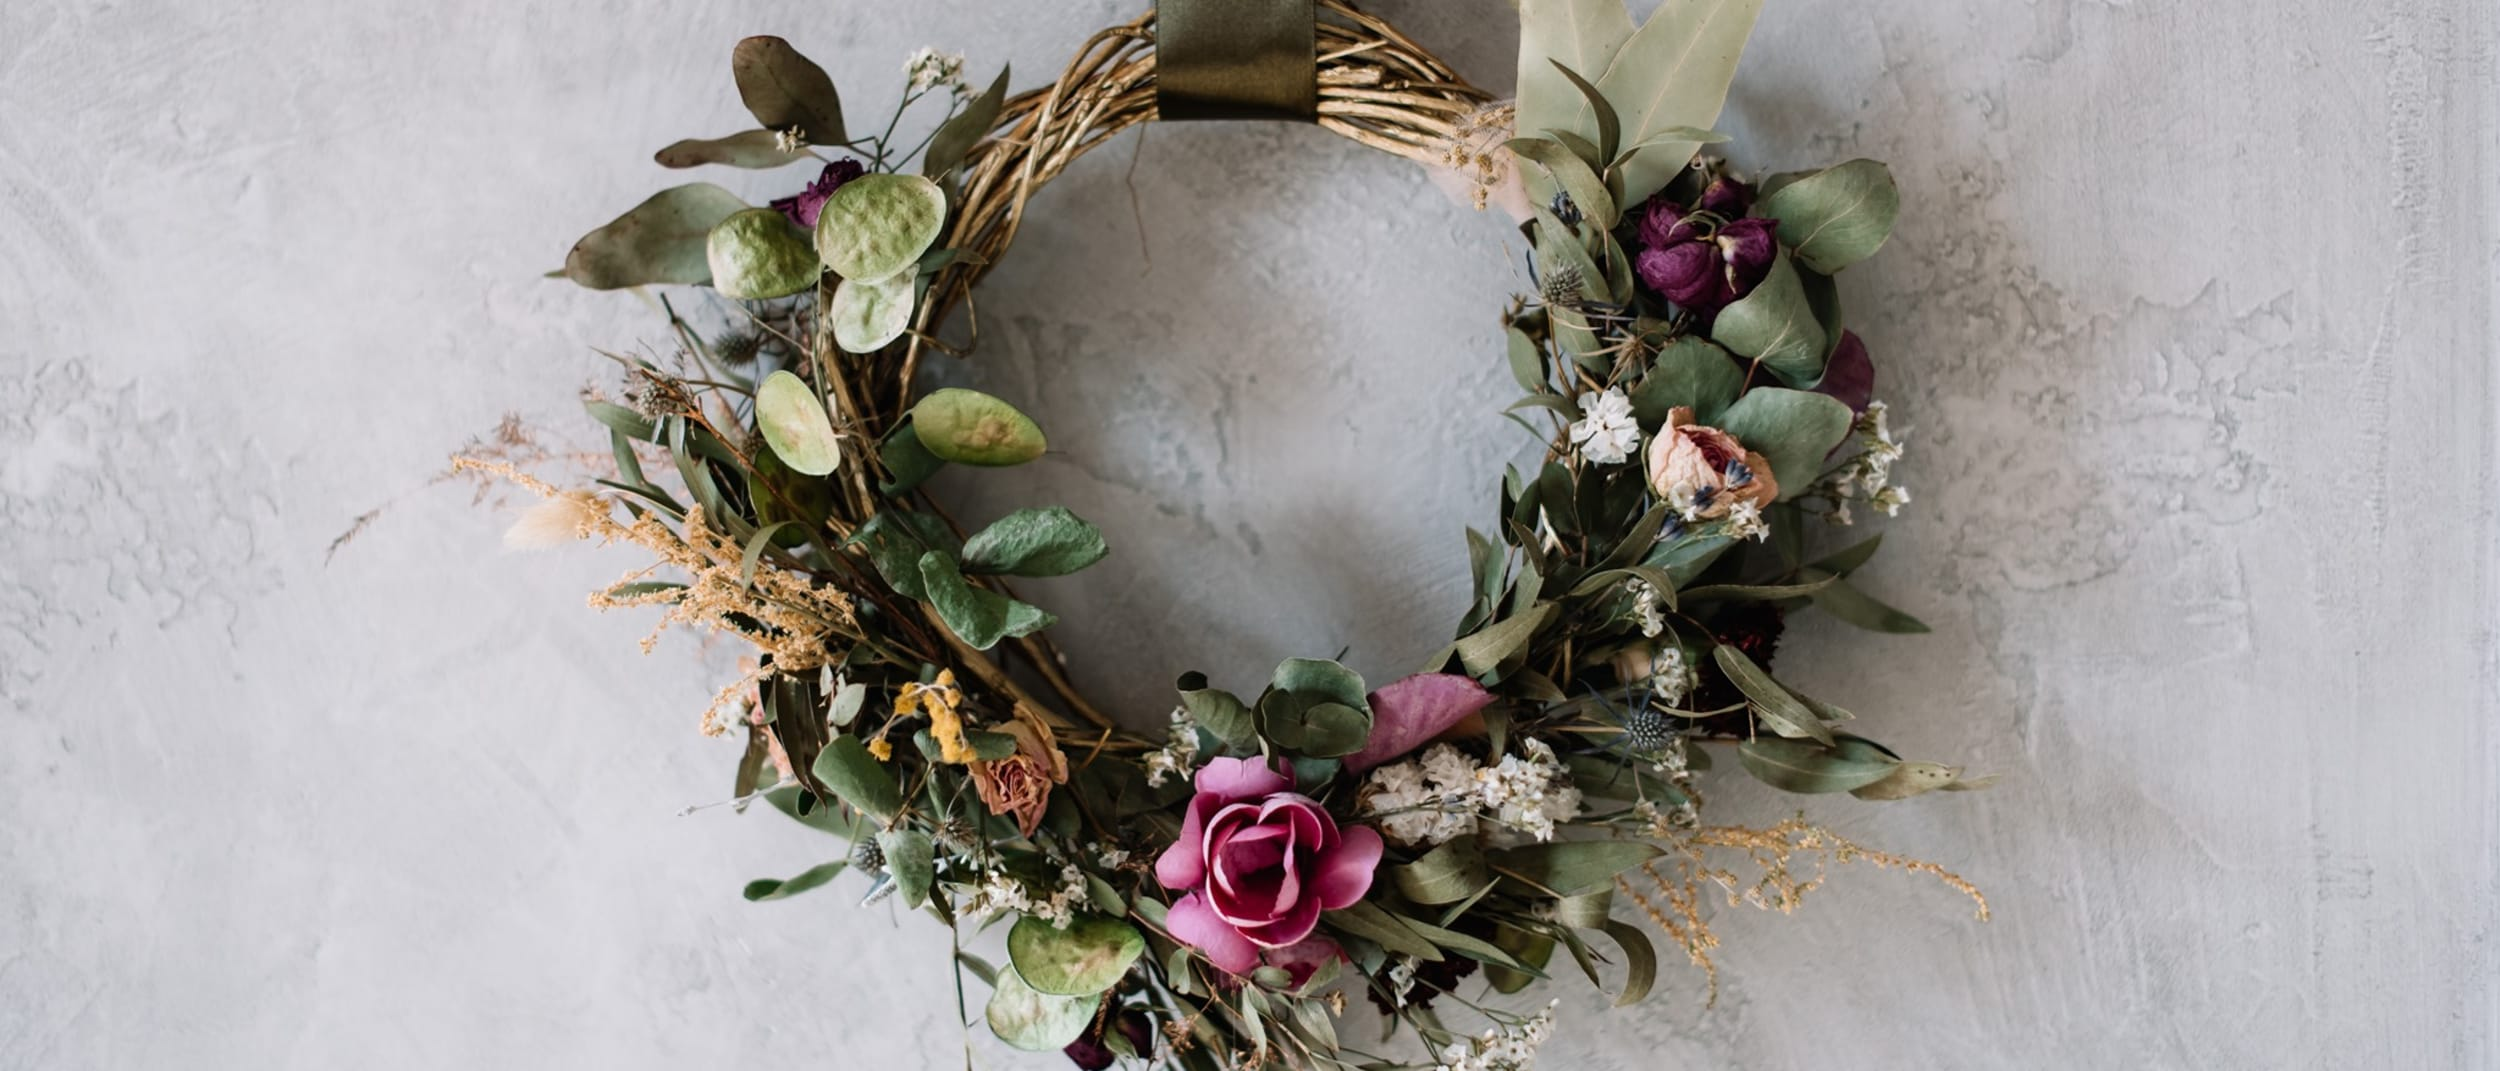 Gro Urban Oasis: Festive Wreath Making Workshop